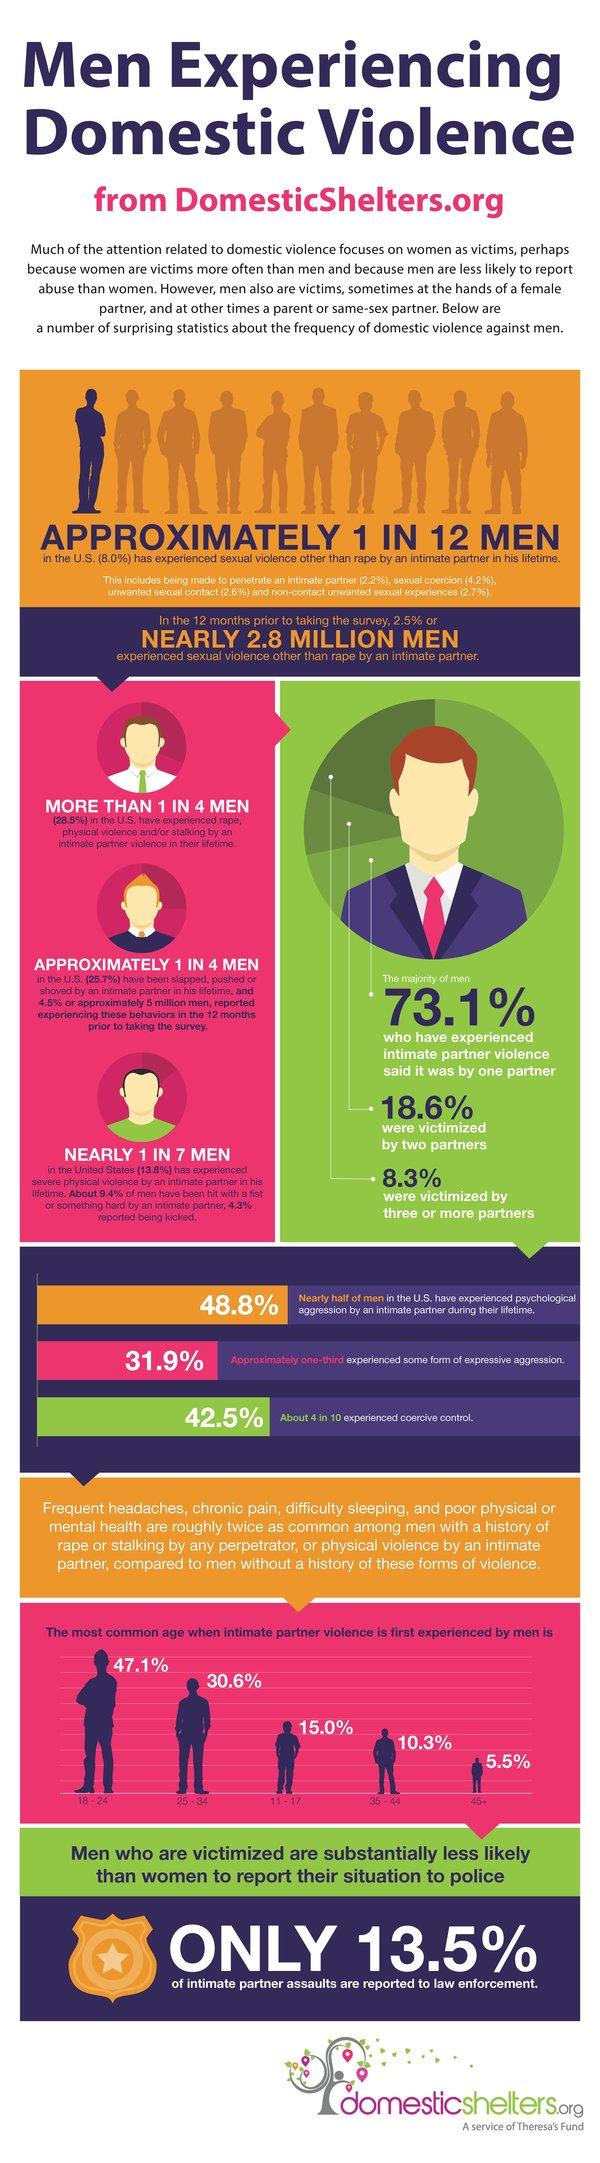 Men Experiencing Domestic Violence